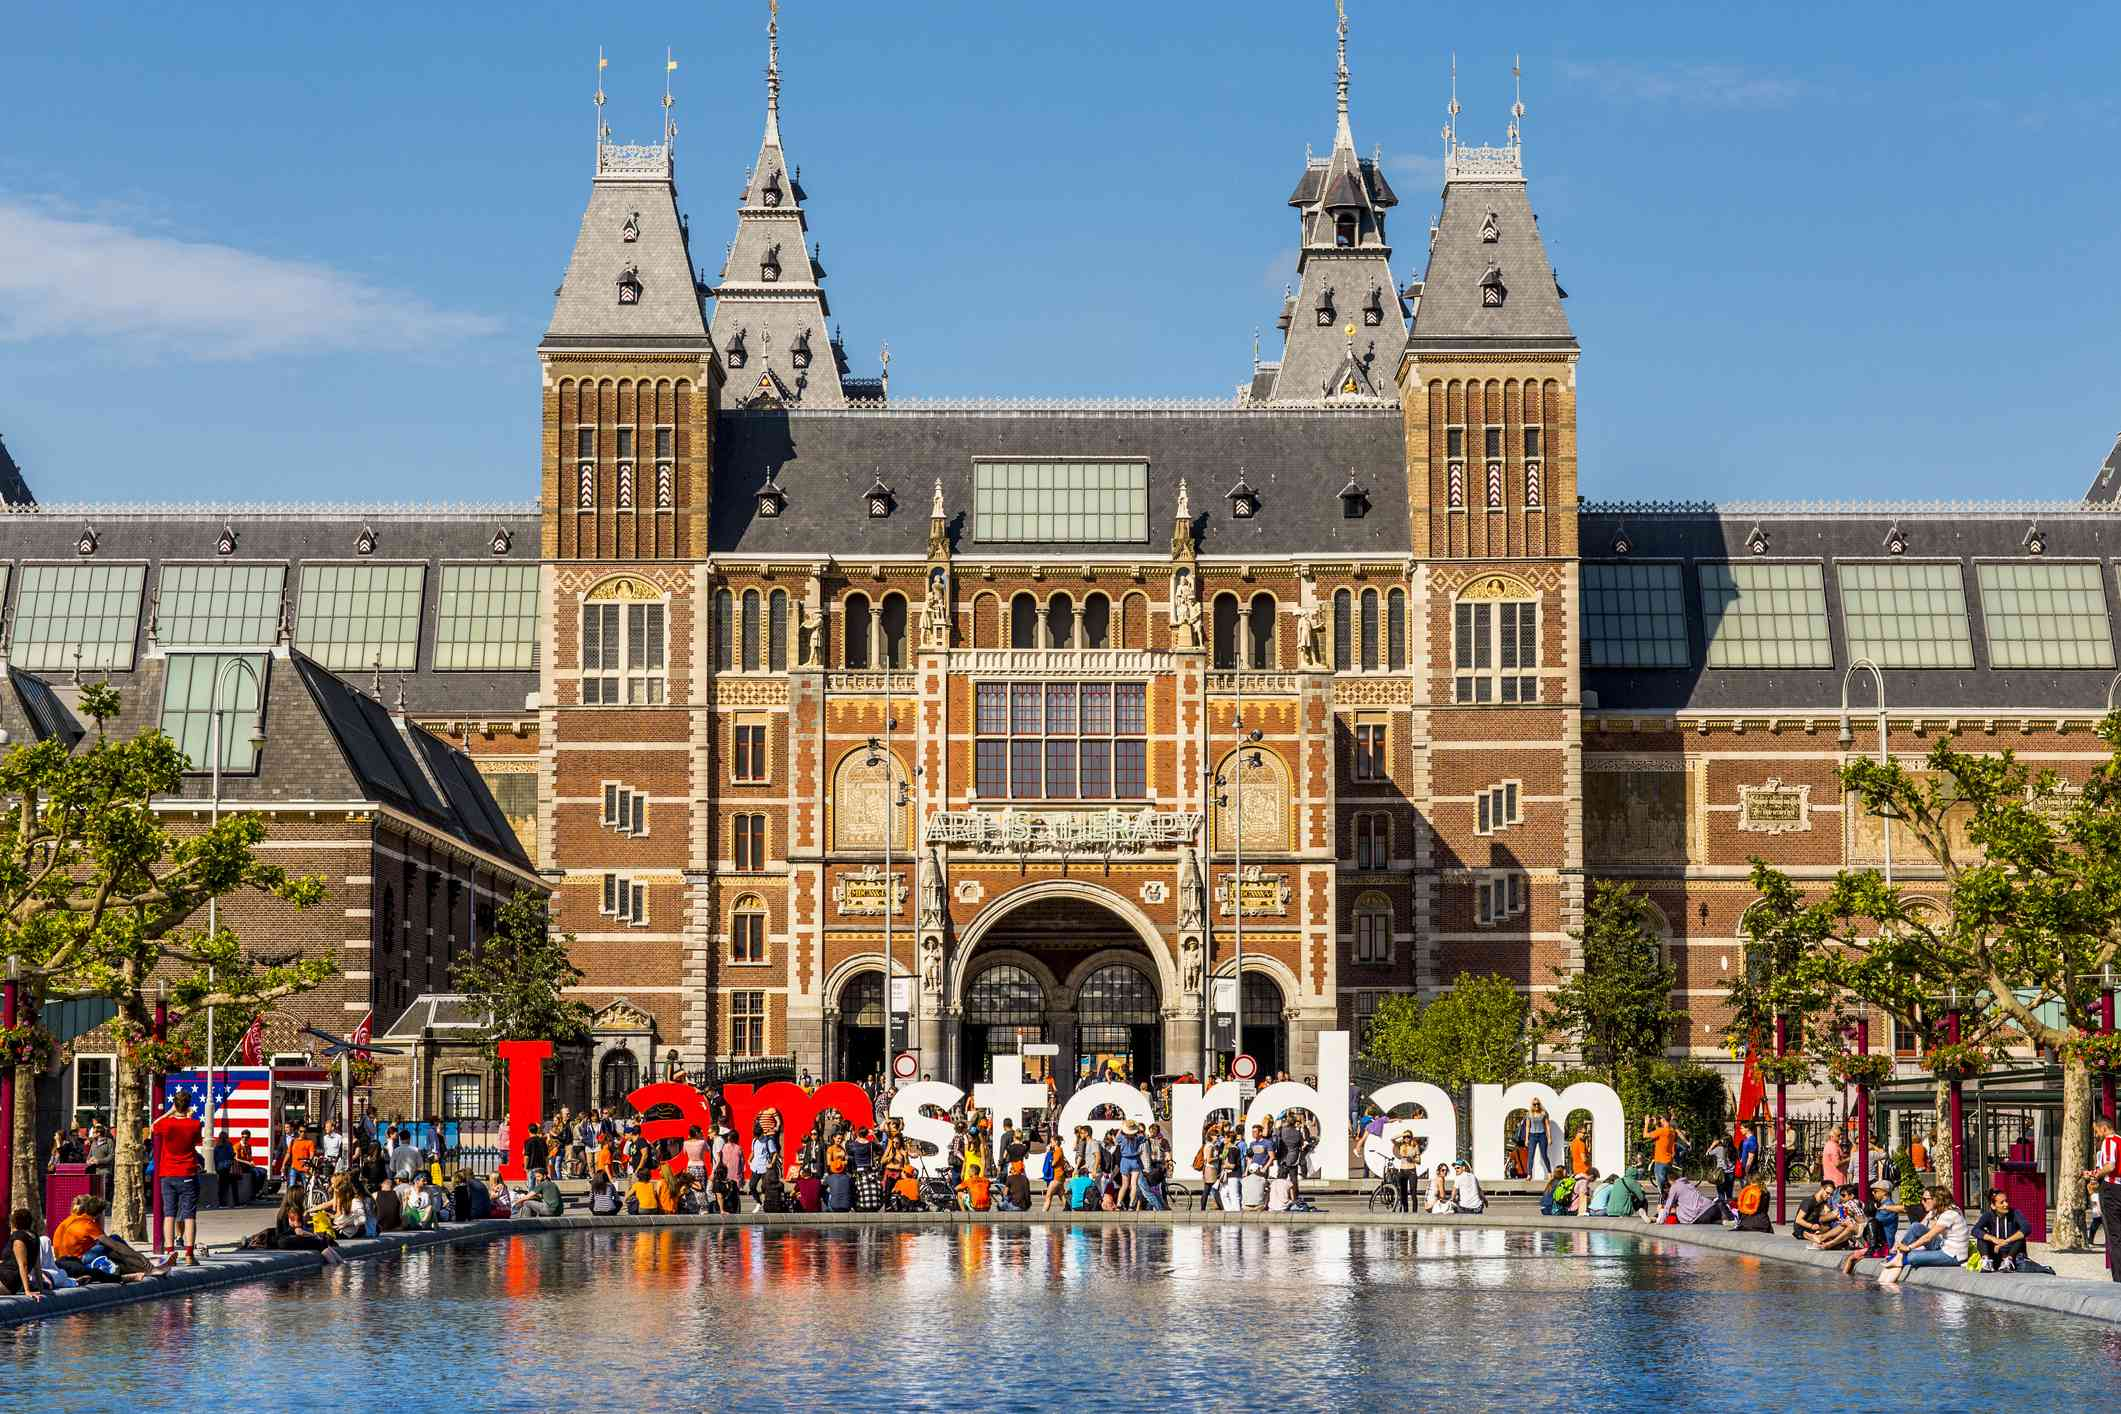 Rikjsmuseum, Amsterdam